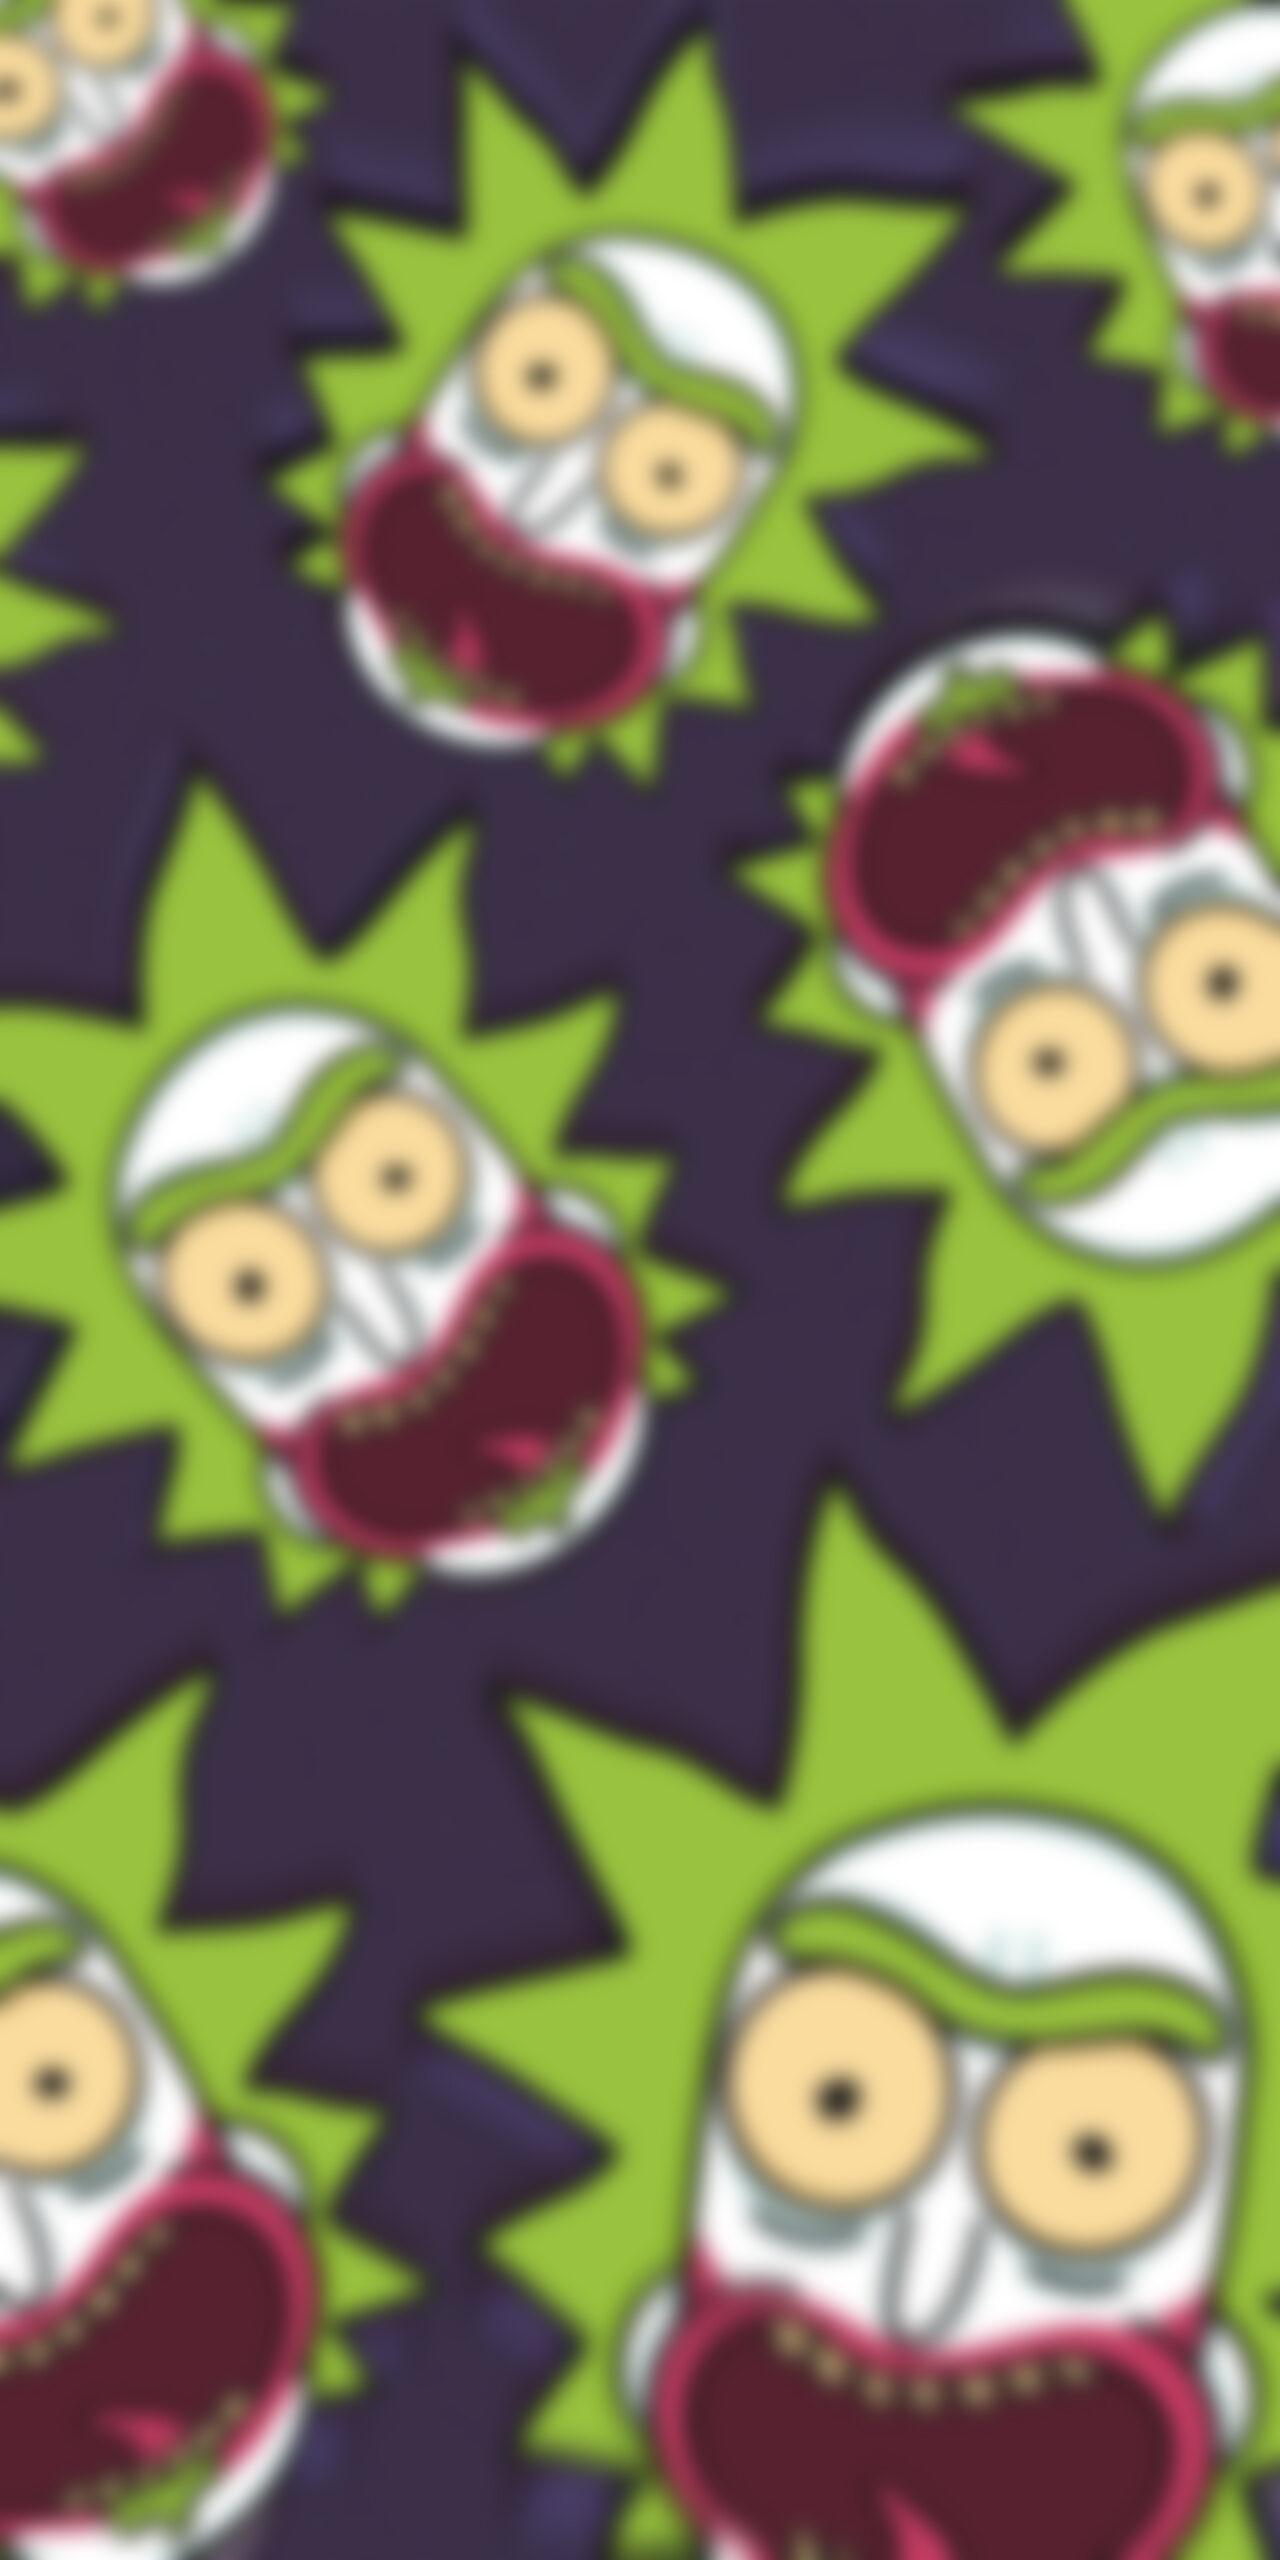 rick and morty rick sanchez joker purple blur wallpaper